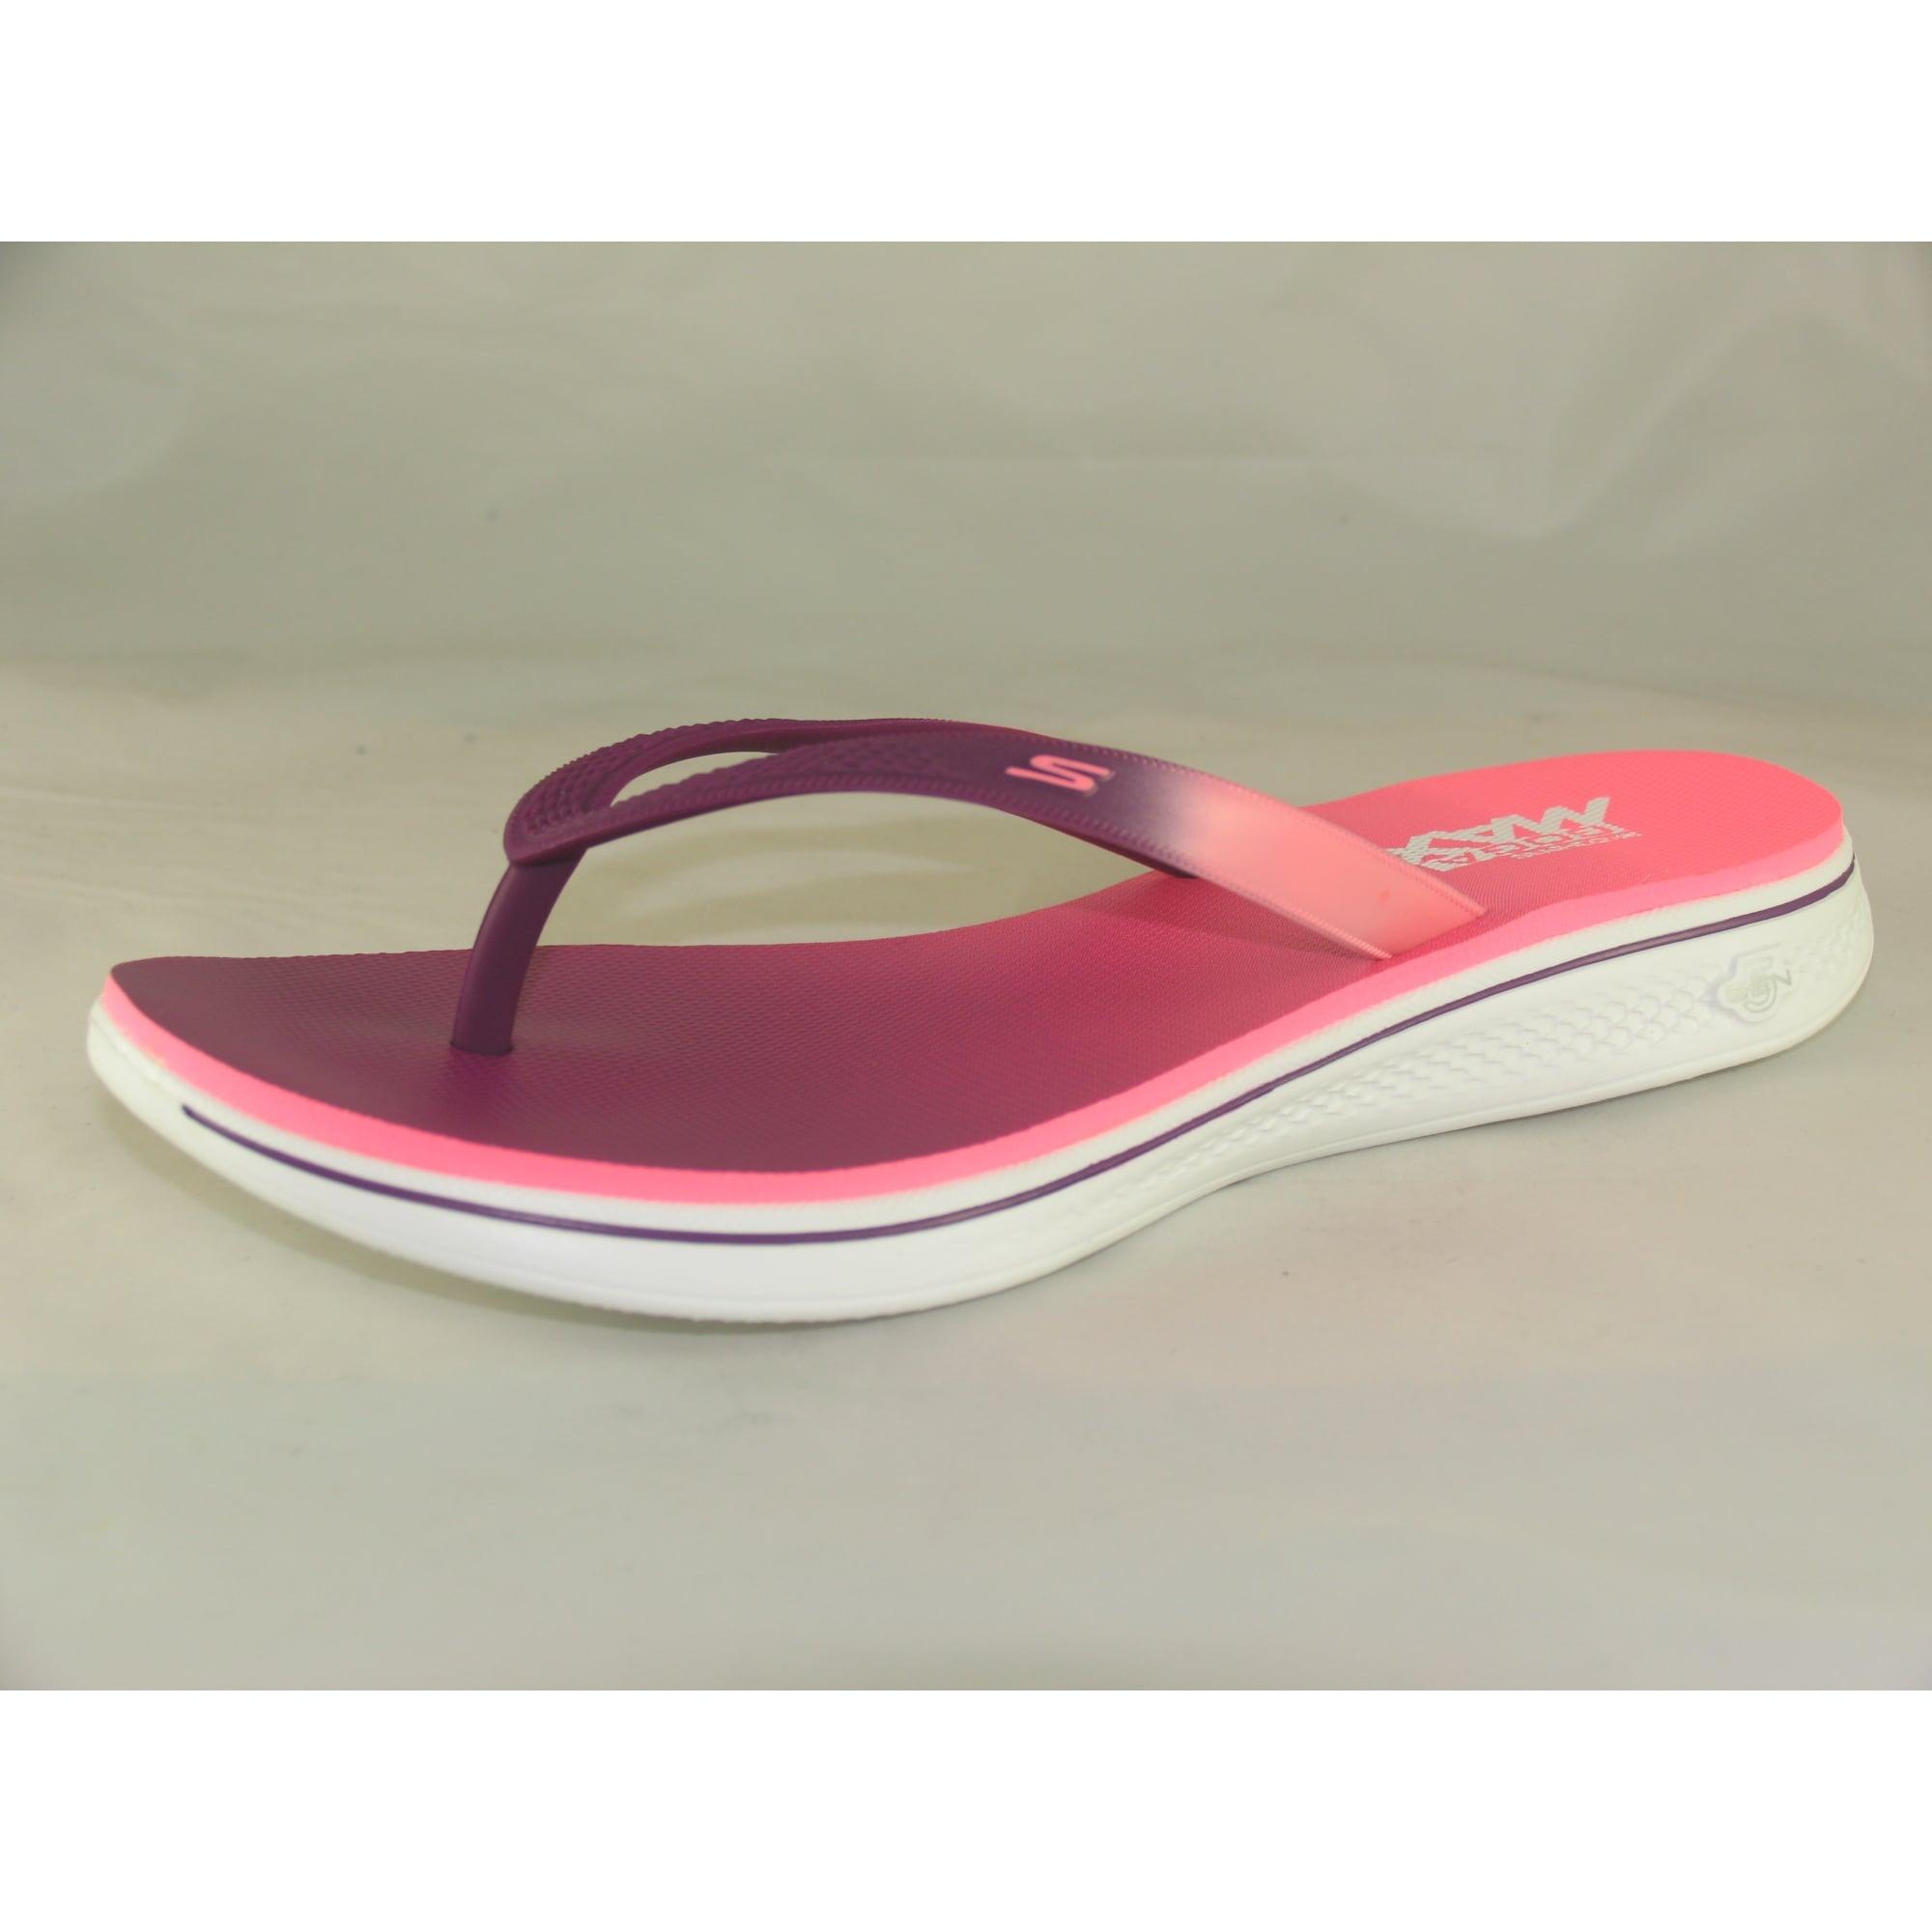 skechers slippers womens